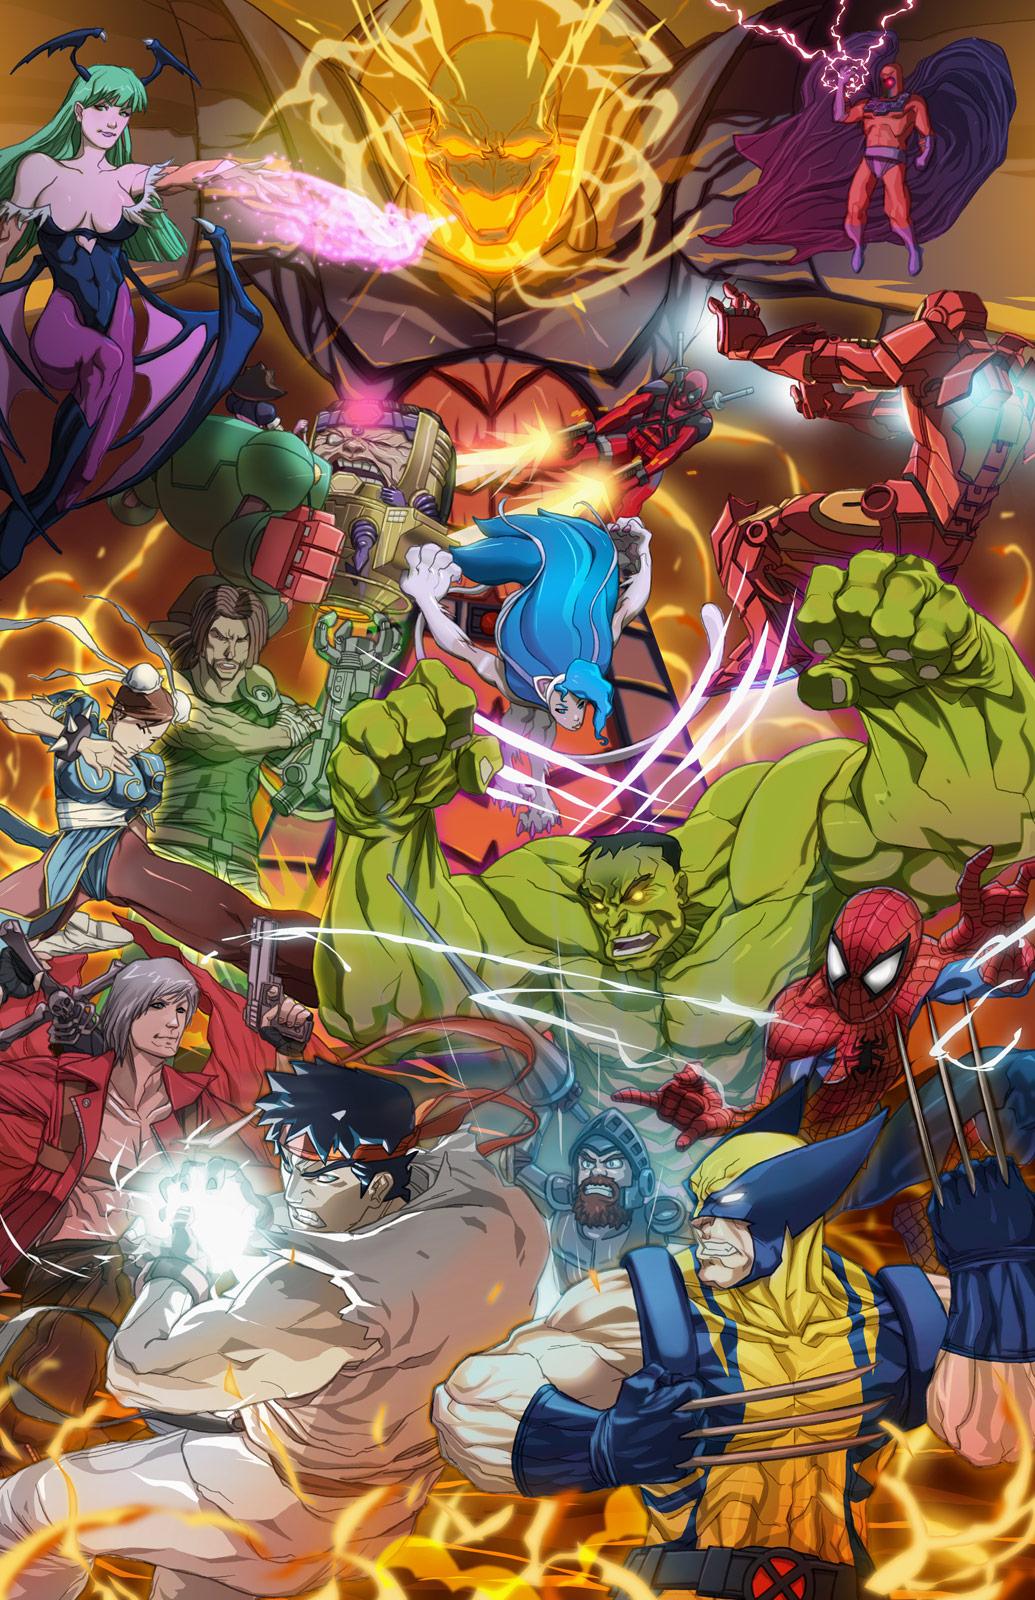 Marvel vs. Capcom 3 Europe fan art contest Italy winner